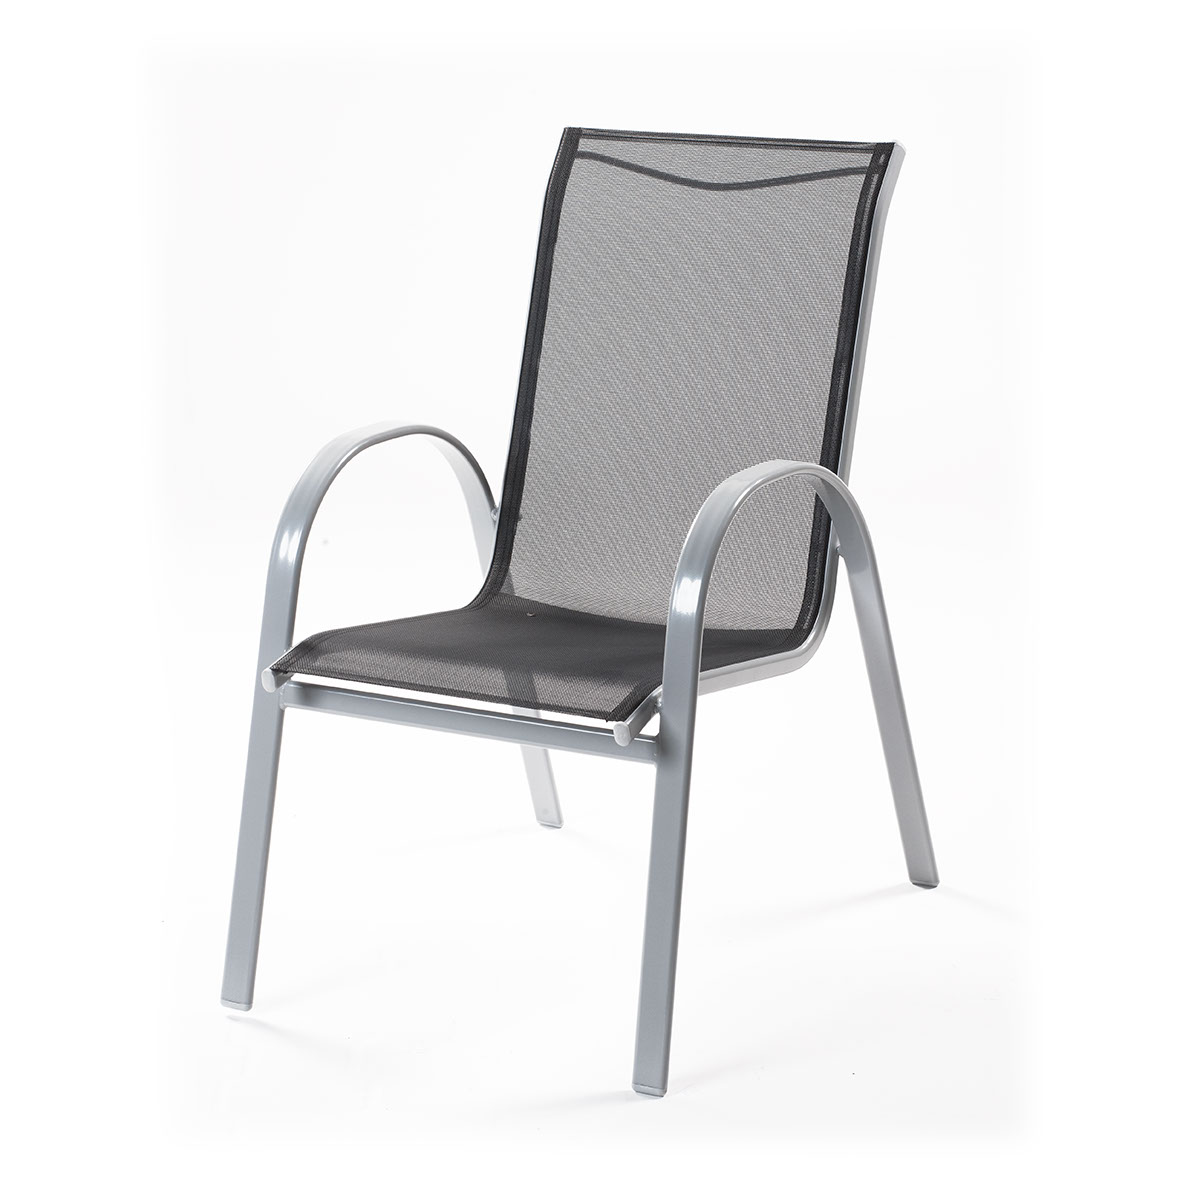 Stohovatelná židle Yotrio-MWH Vera